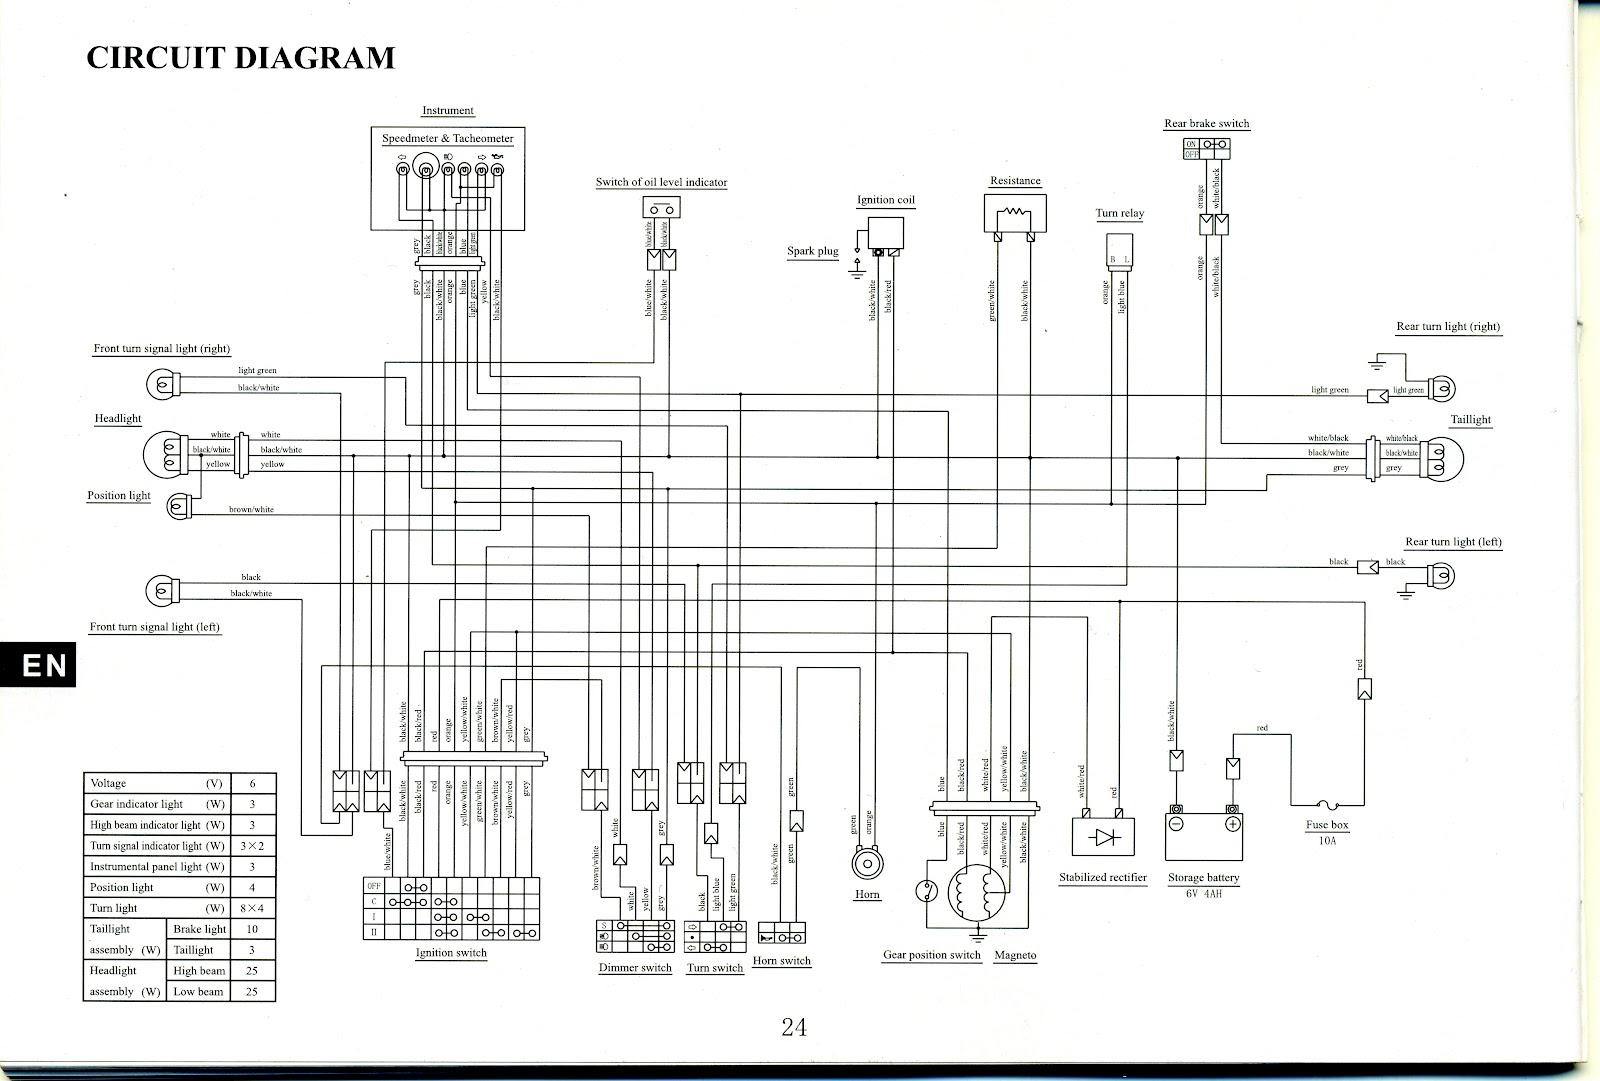 suzuki gs550e wiring diagram 2006 dodge ram shakotoms ax100 two wheels oldschool co nz